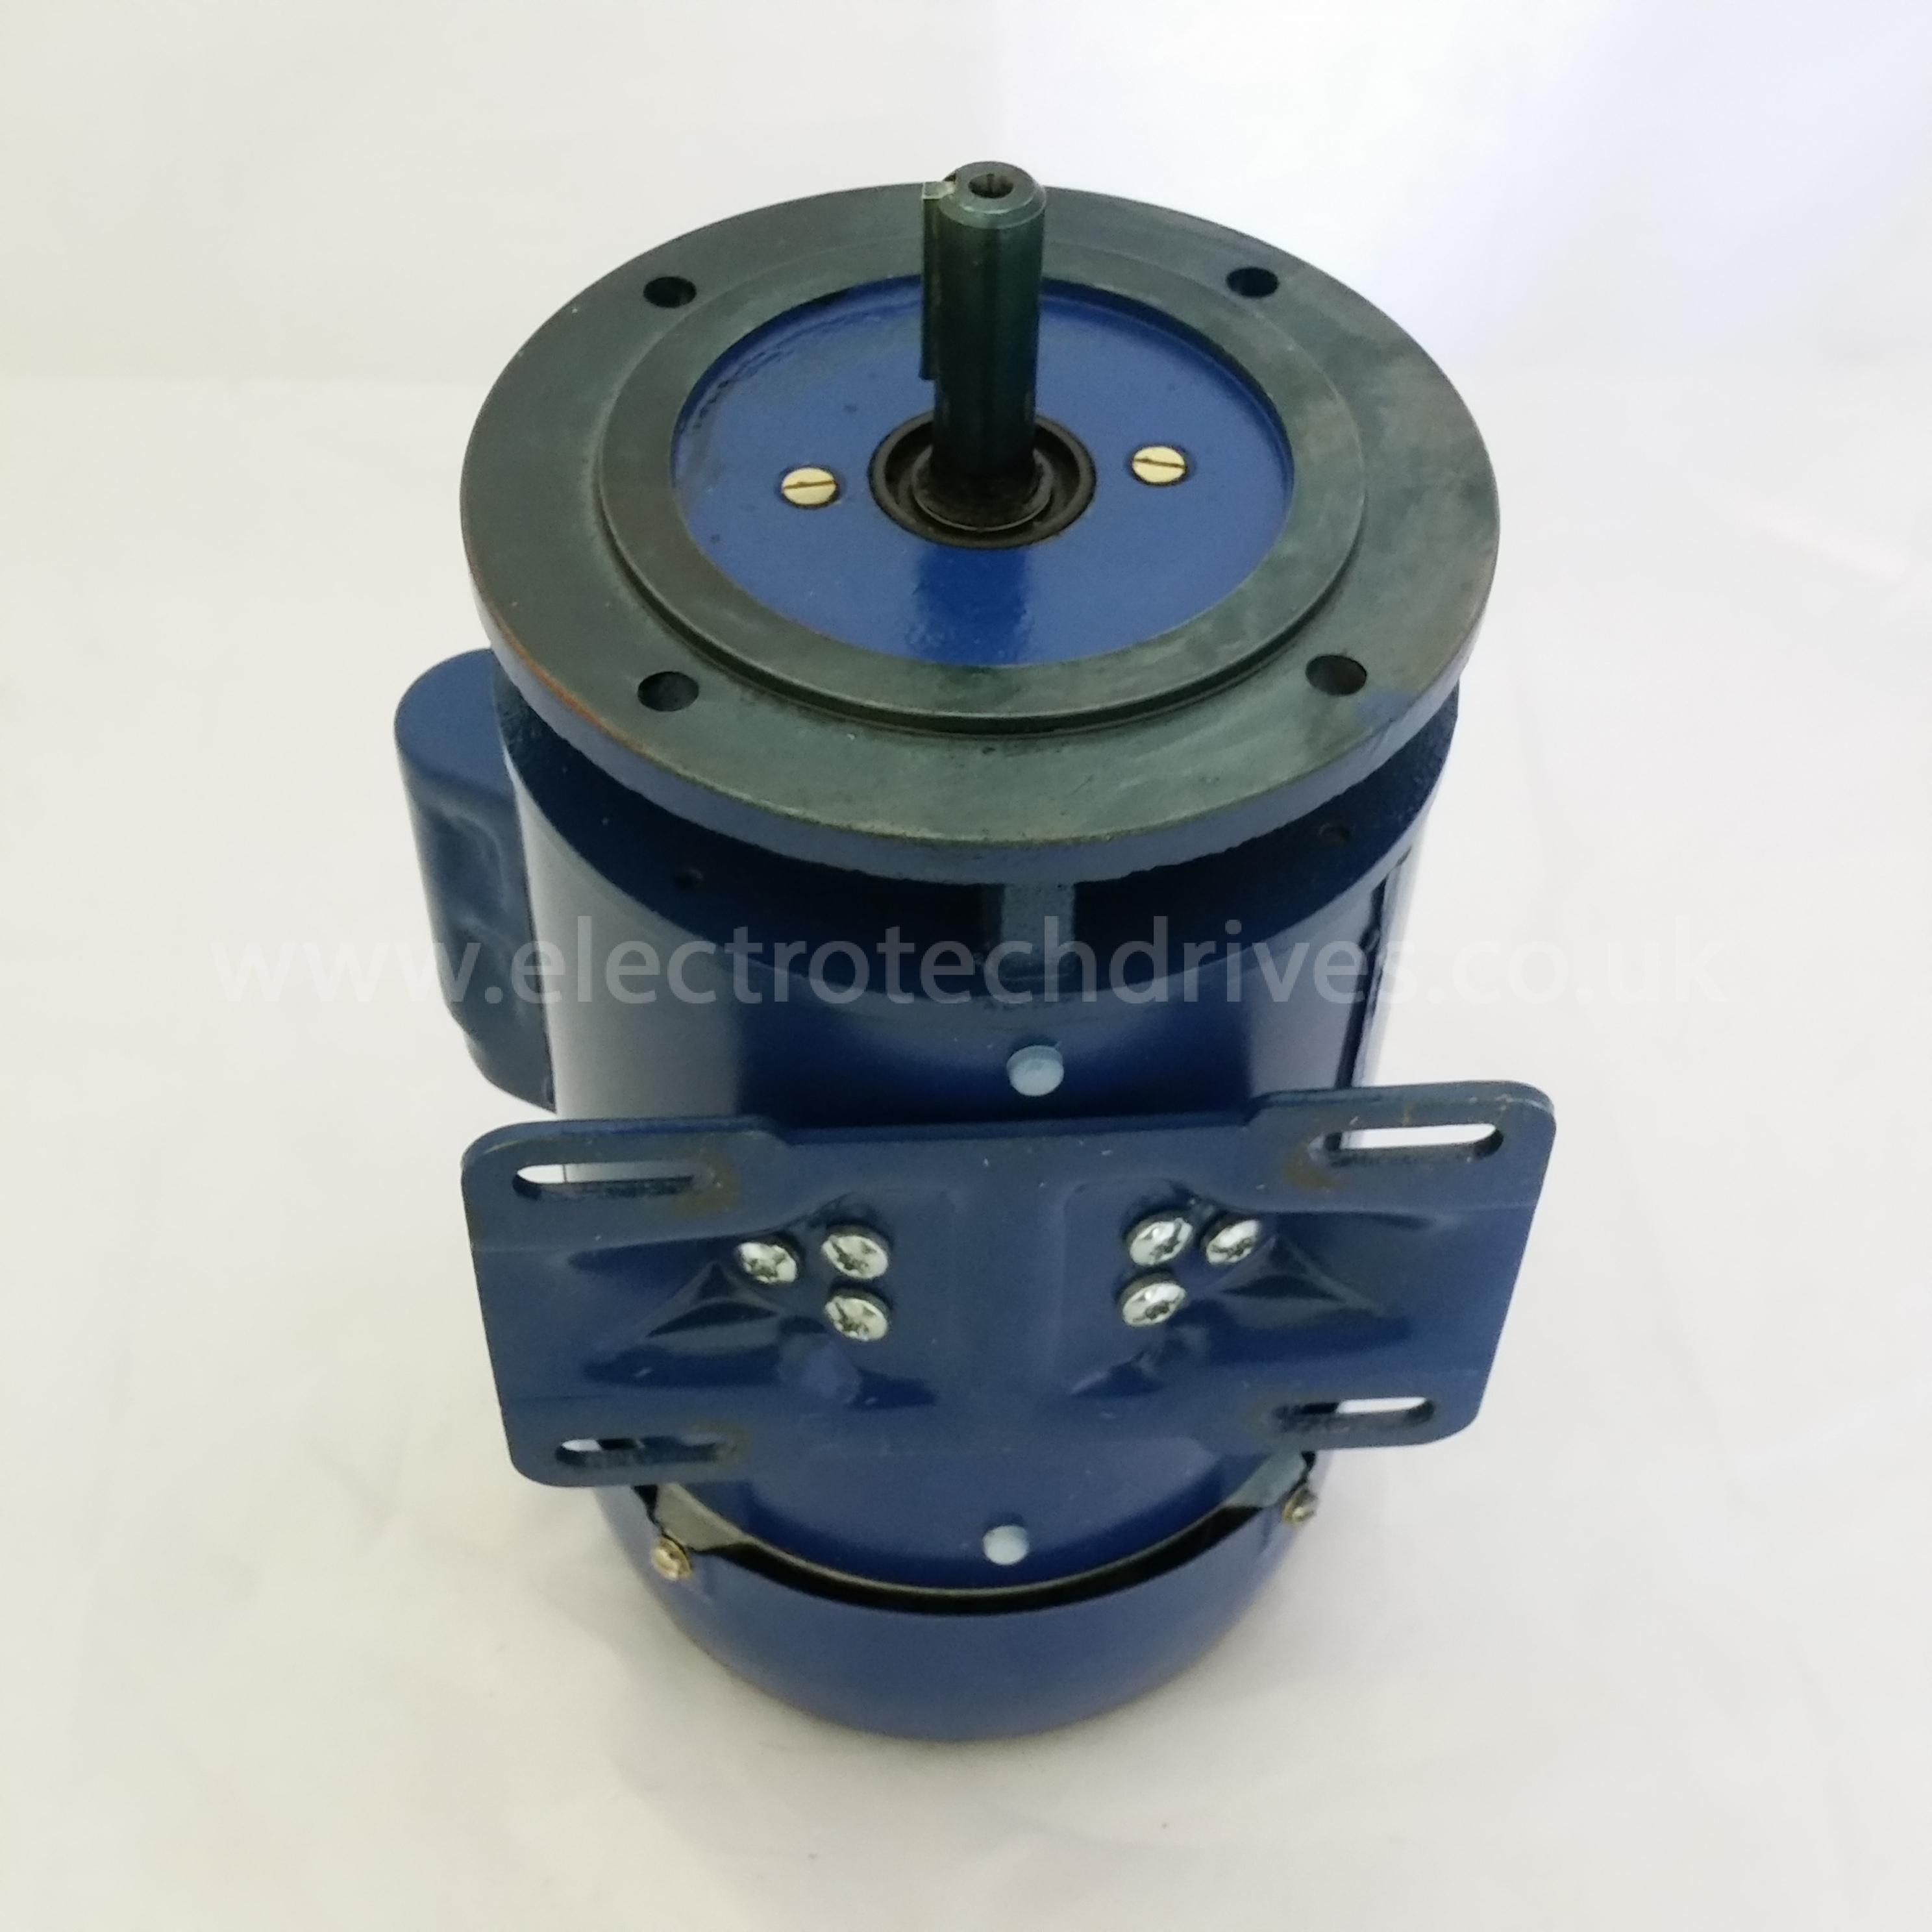 Crompton greaves single phase motor 16mm58 shaft 370w 12hp 15599 cheapraybanclubmaster Choice Image